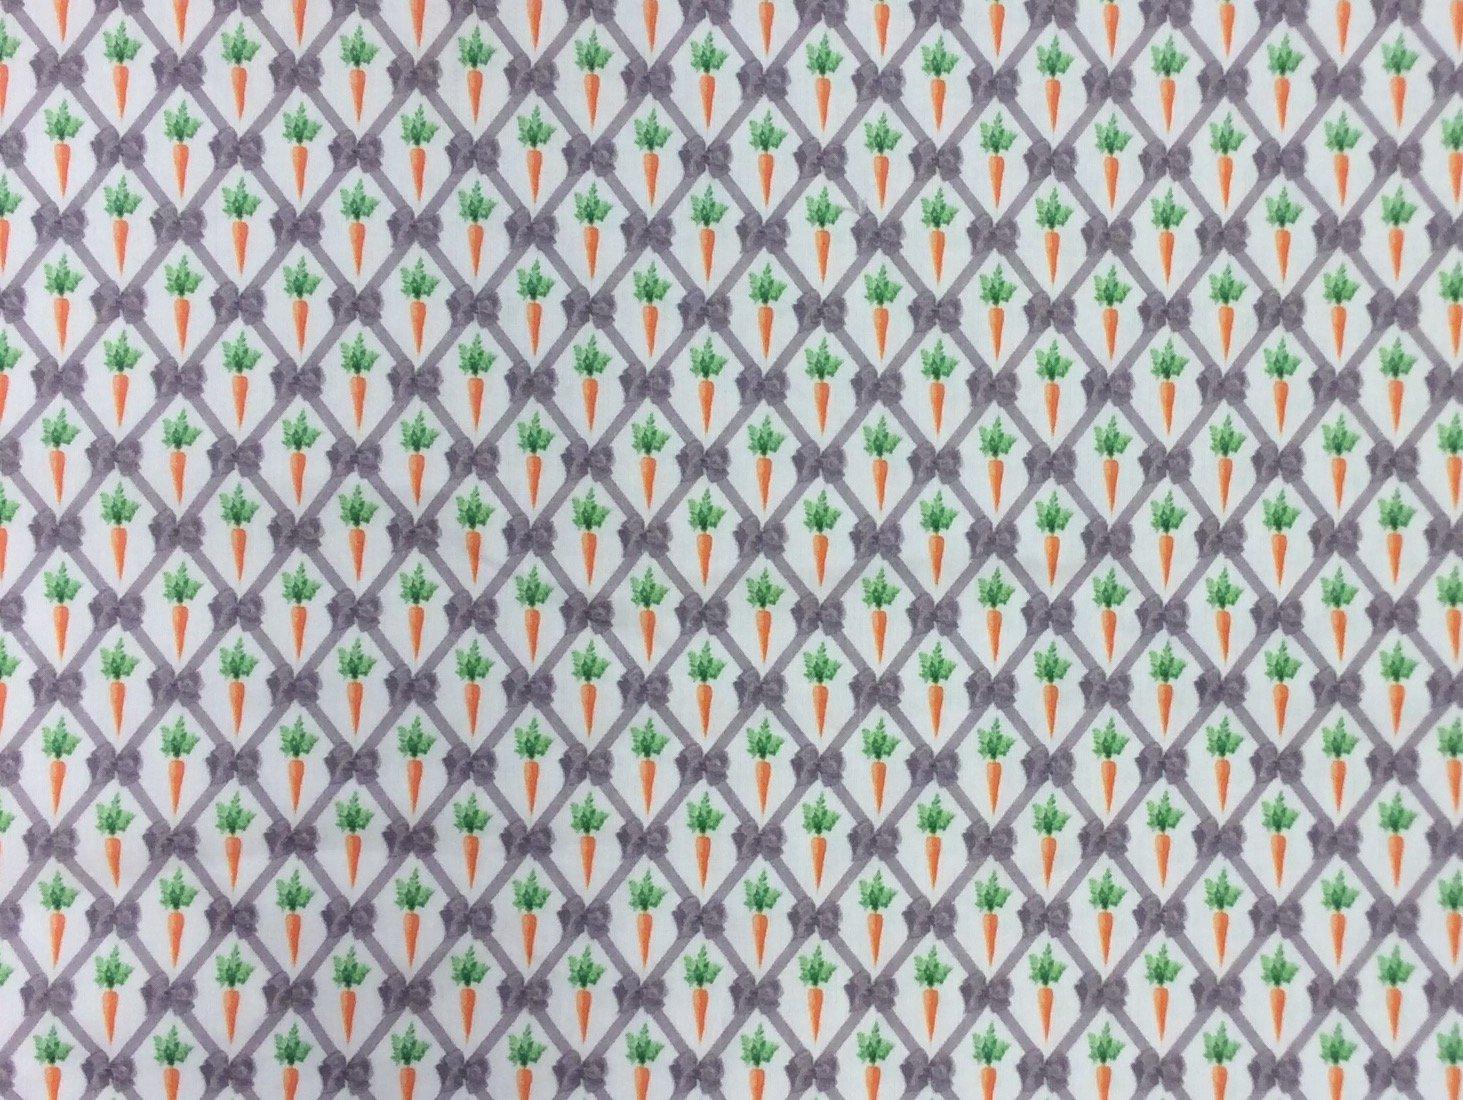 France Bunny Rabbit Carrots Retro Digital Printed  Cotton Quilt Fabric ST08